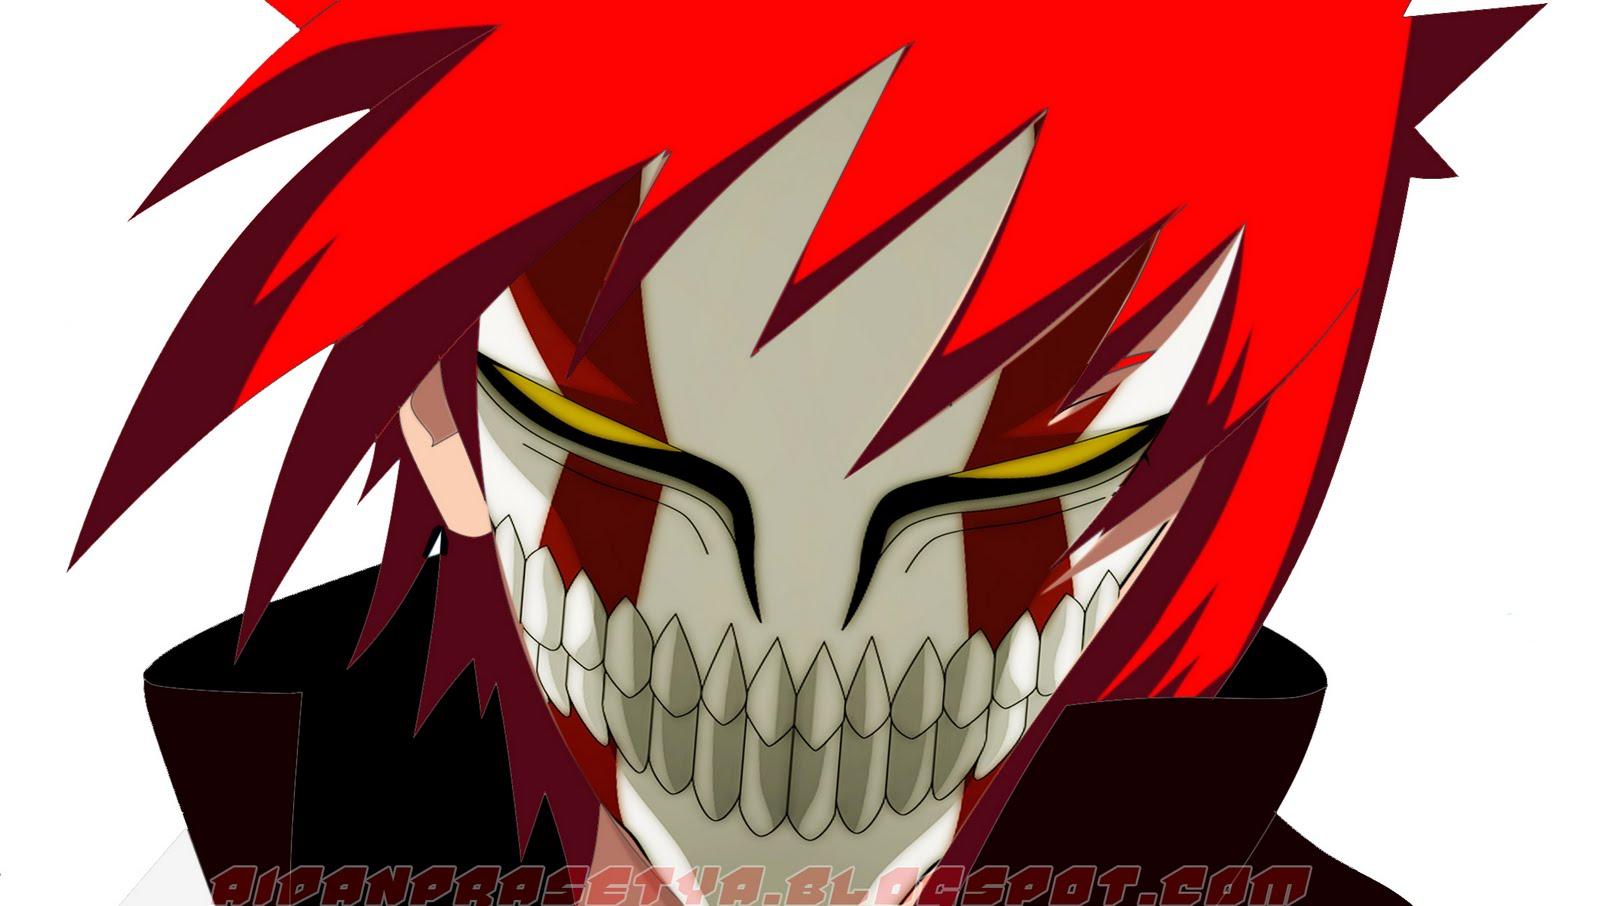 http://3.bp.blogspot.com/-g7dOw8ov2hk/TdXLUpVdjEI/AAAAAAAAAFk/3aP5LiHXOc4/s1600/Uchiha_Sasuke_Sharingan_by_ak_kurohitsugi.jpg